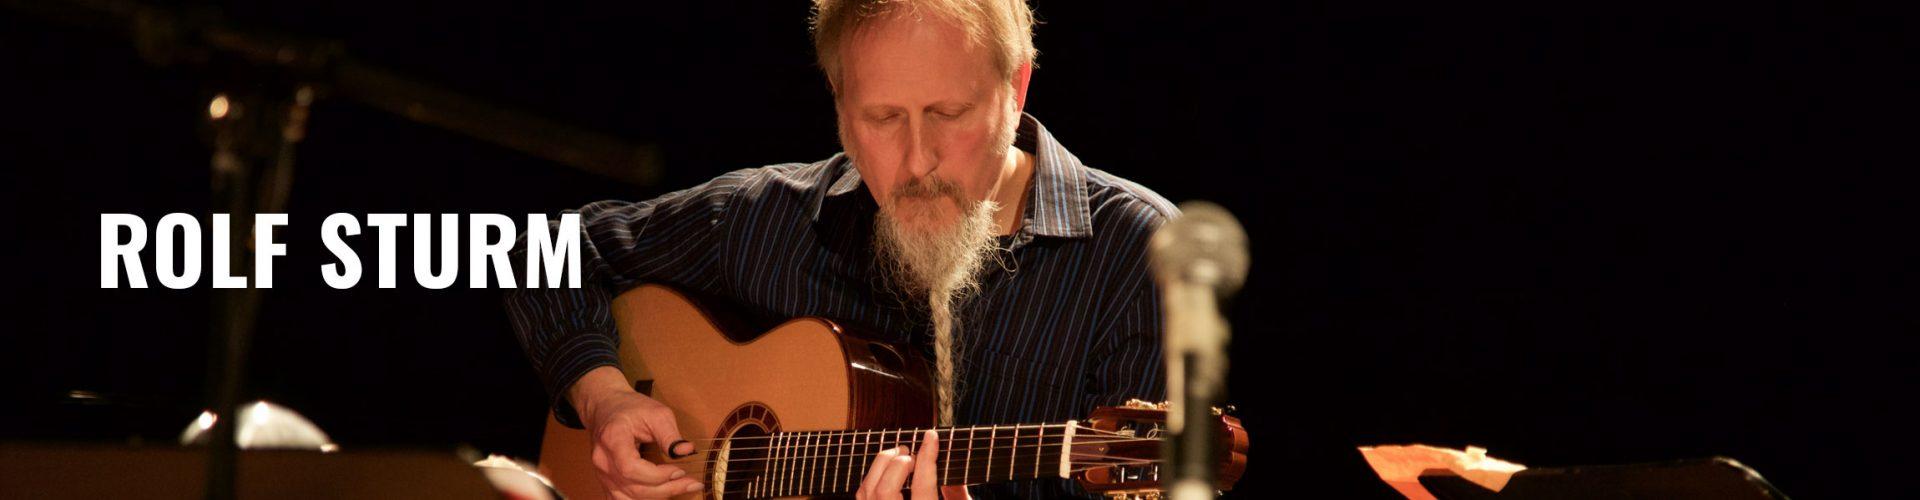 Guitarist Rolf Sturm